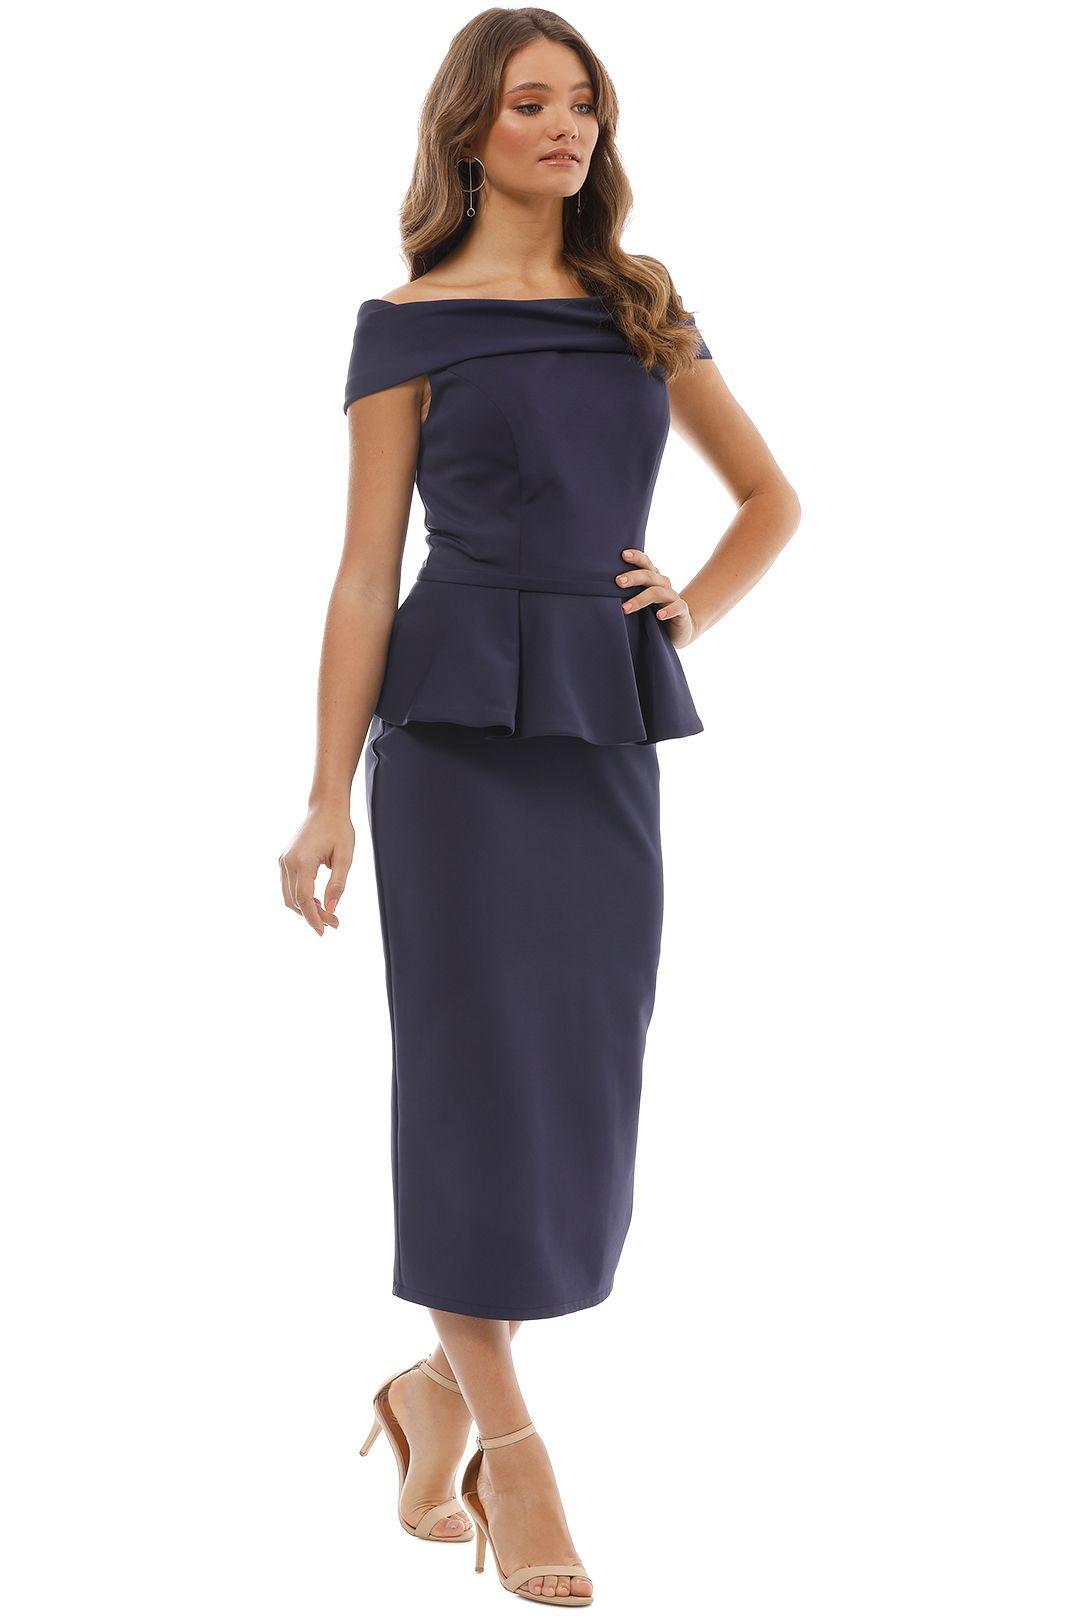 Tinaholy - Navy Off Shoulder Peplum Dress - Side